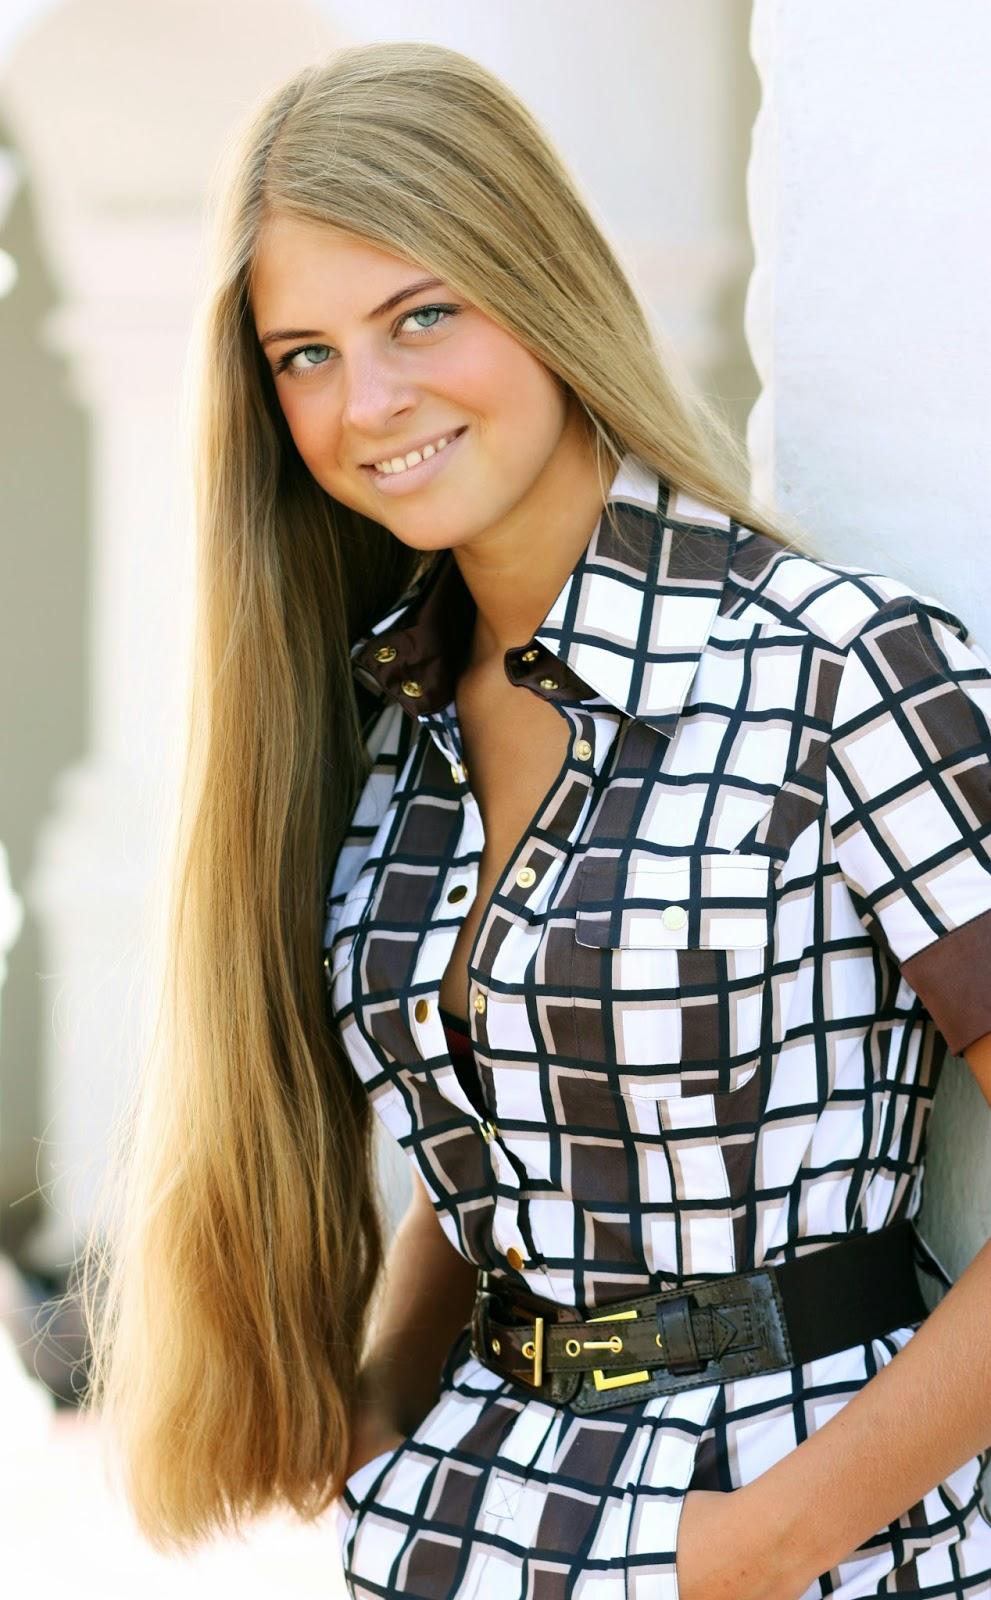 Long Haired Women Hall of Fame: Evgenia Valueva #4